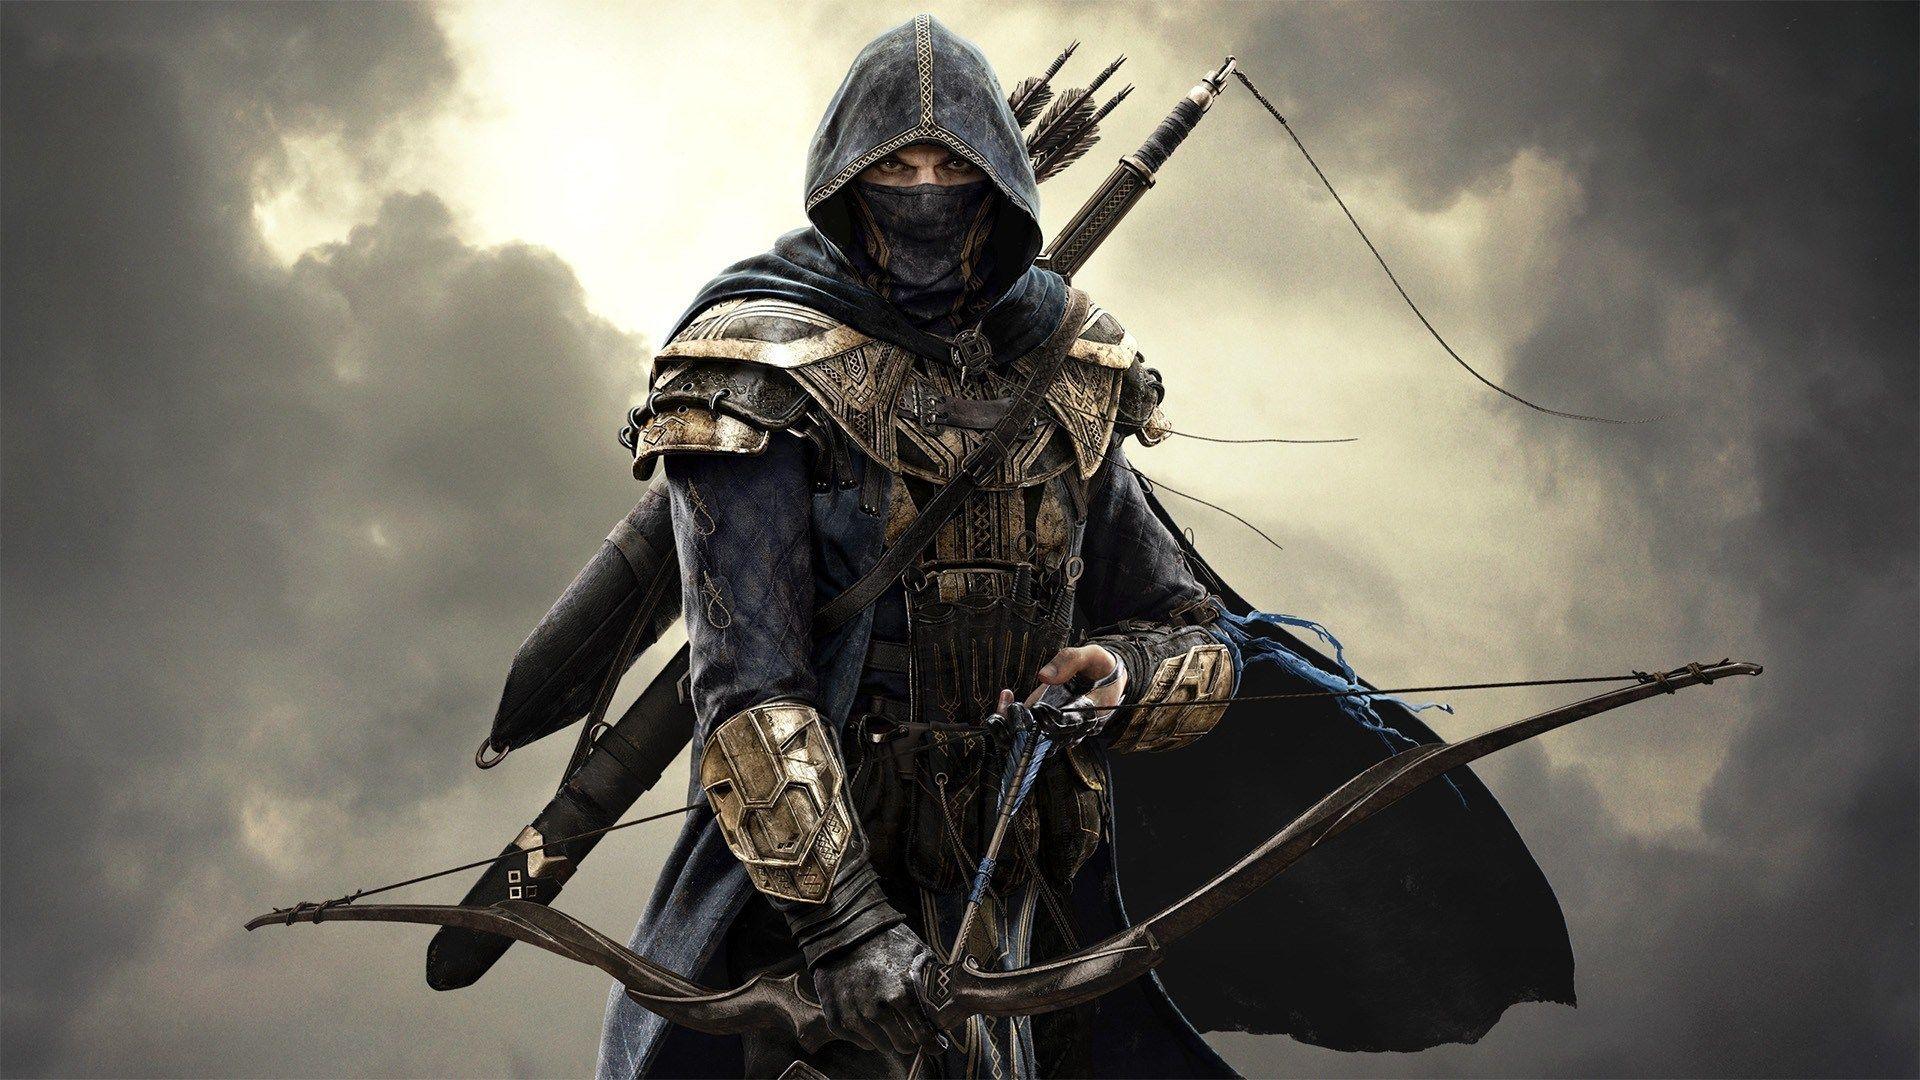 Video - The Elder Scrolls Online vs. Skyrim Comparing Windhelm ...